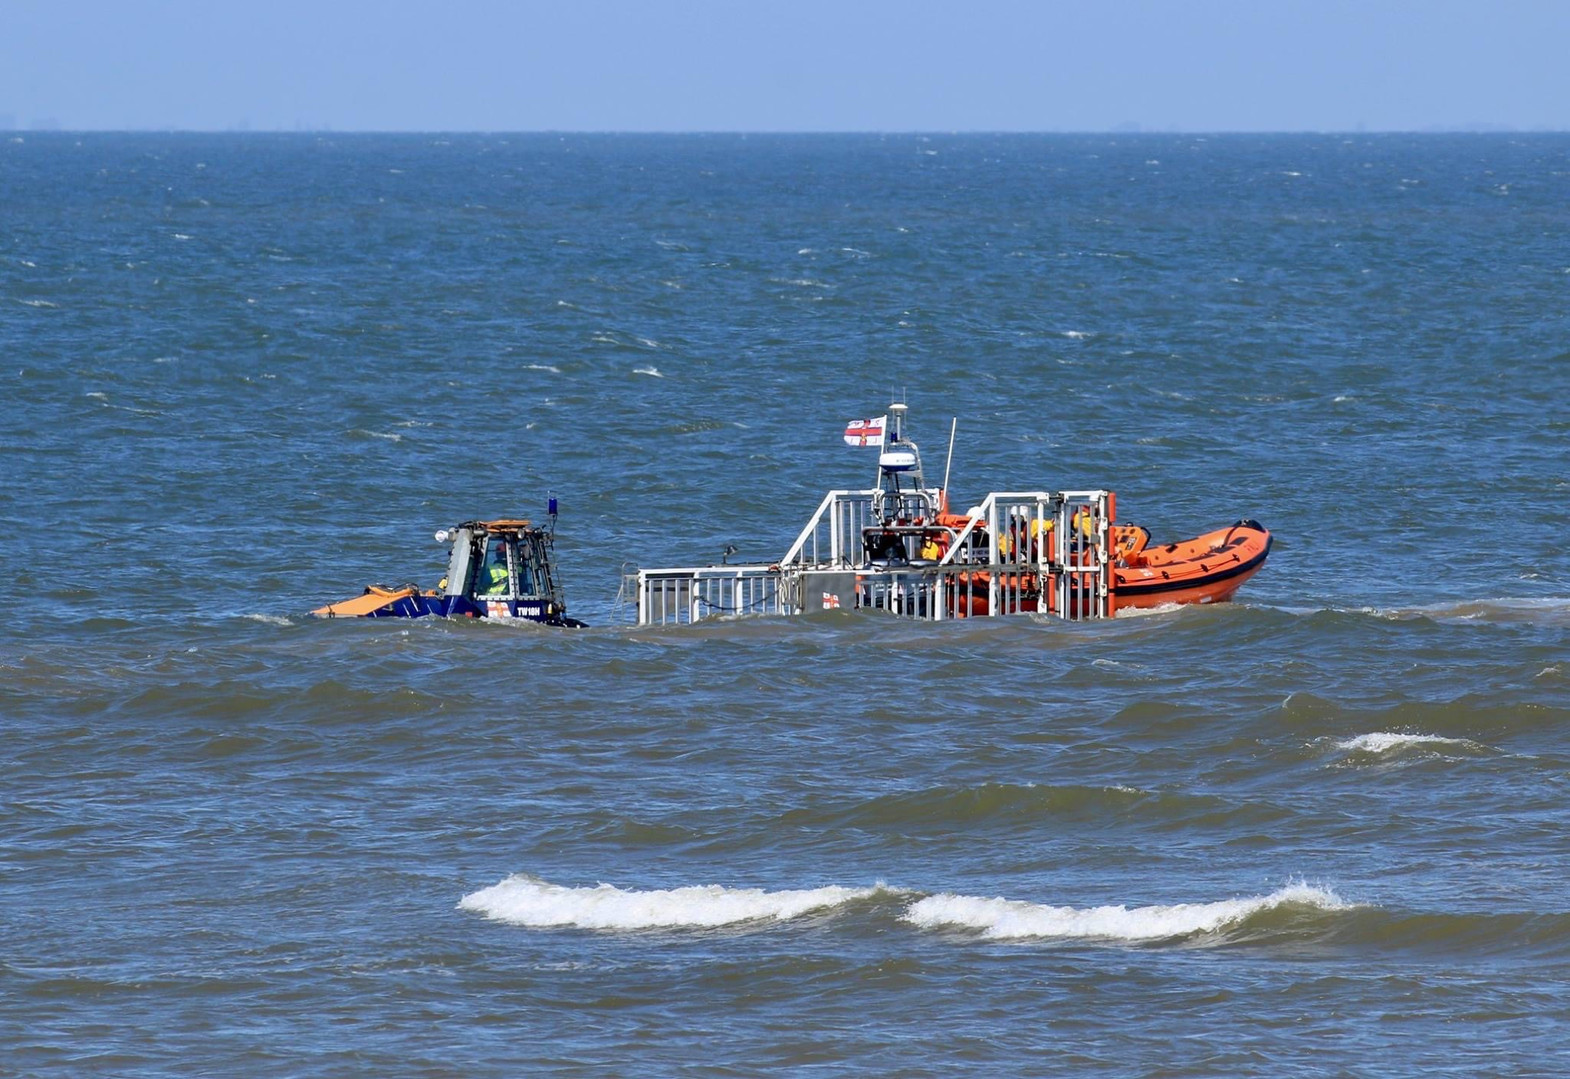 RNLI lifeboat launch Old Hunstanton